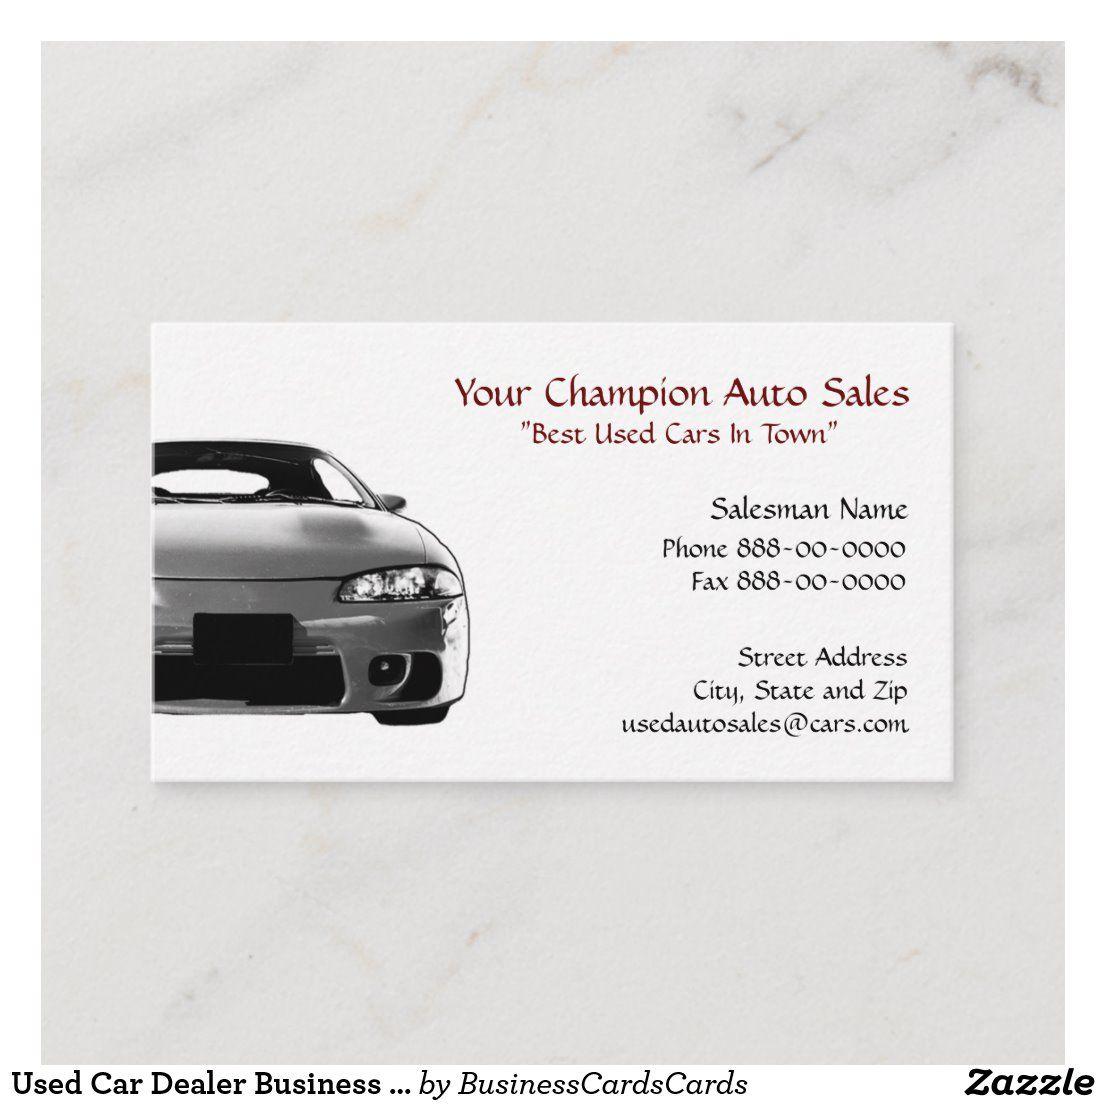 Used Car Dealer Business Card Zazzle Com Used Car Dealer Car Dealer Used Cars